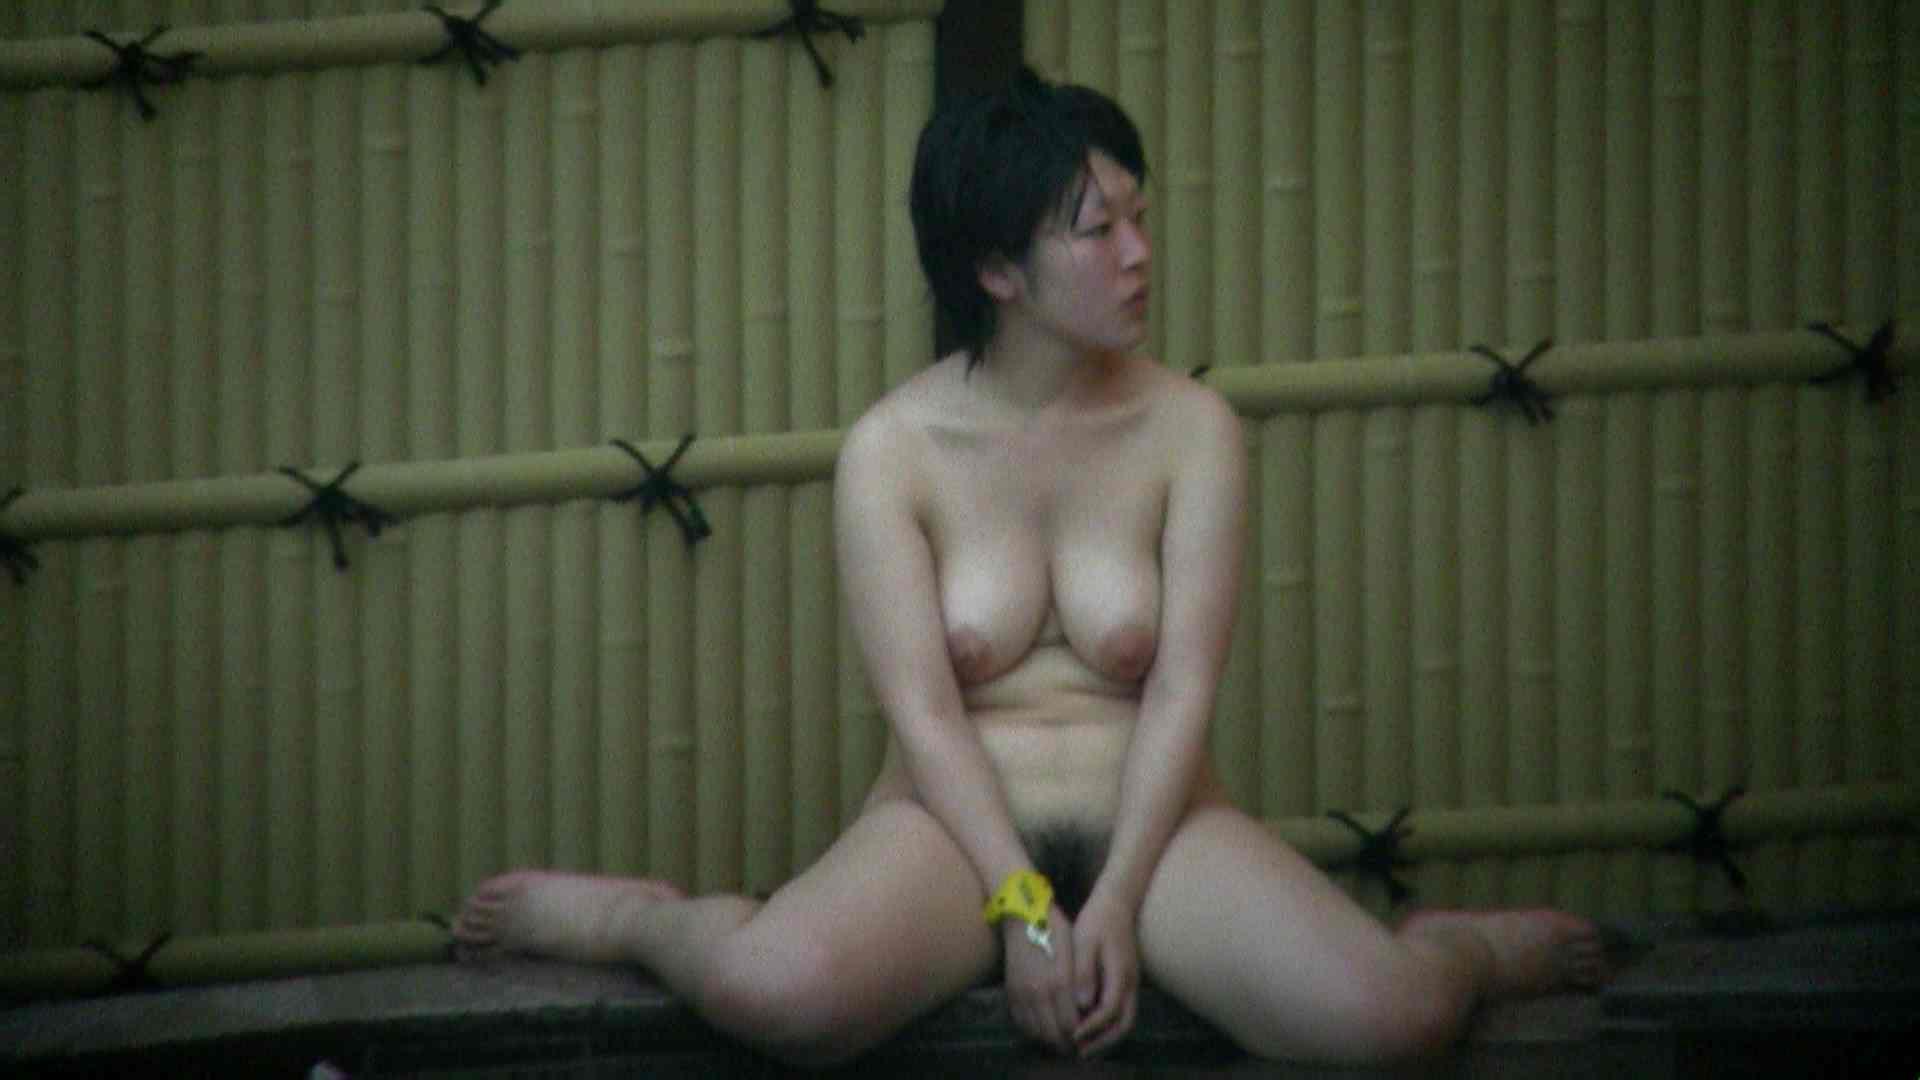 Aquaな露天風呂Vol.05【VIP】 露天風呂編 | 盗撮シリーズ  112PIX 31